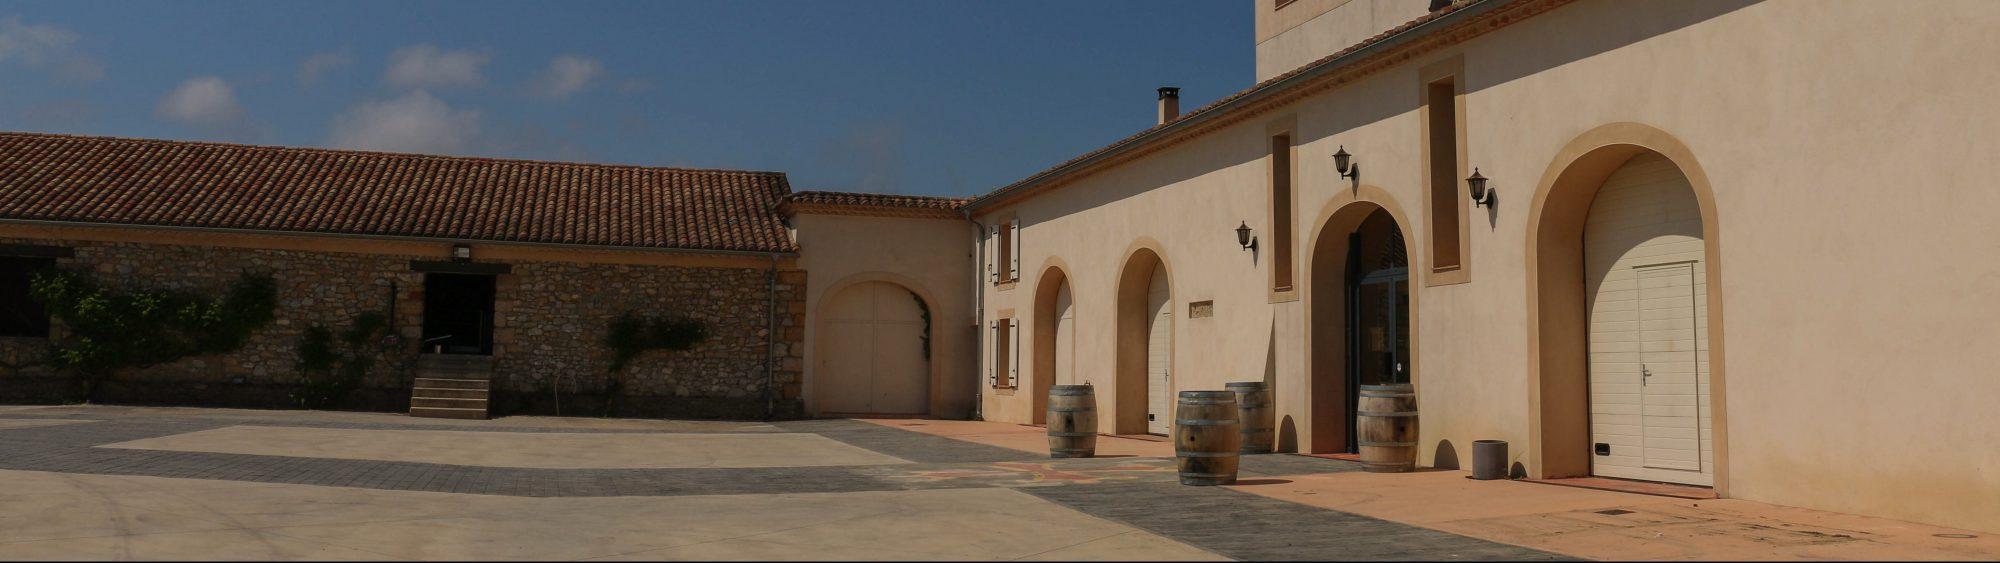 Château Camplazens - domaine de la clape